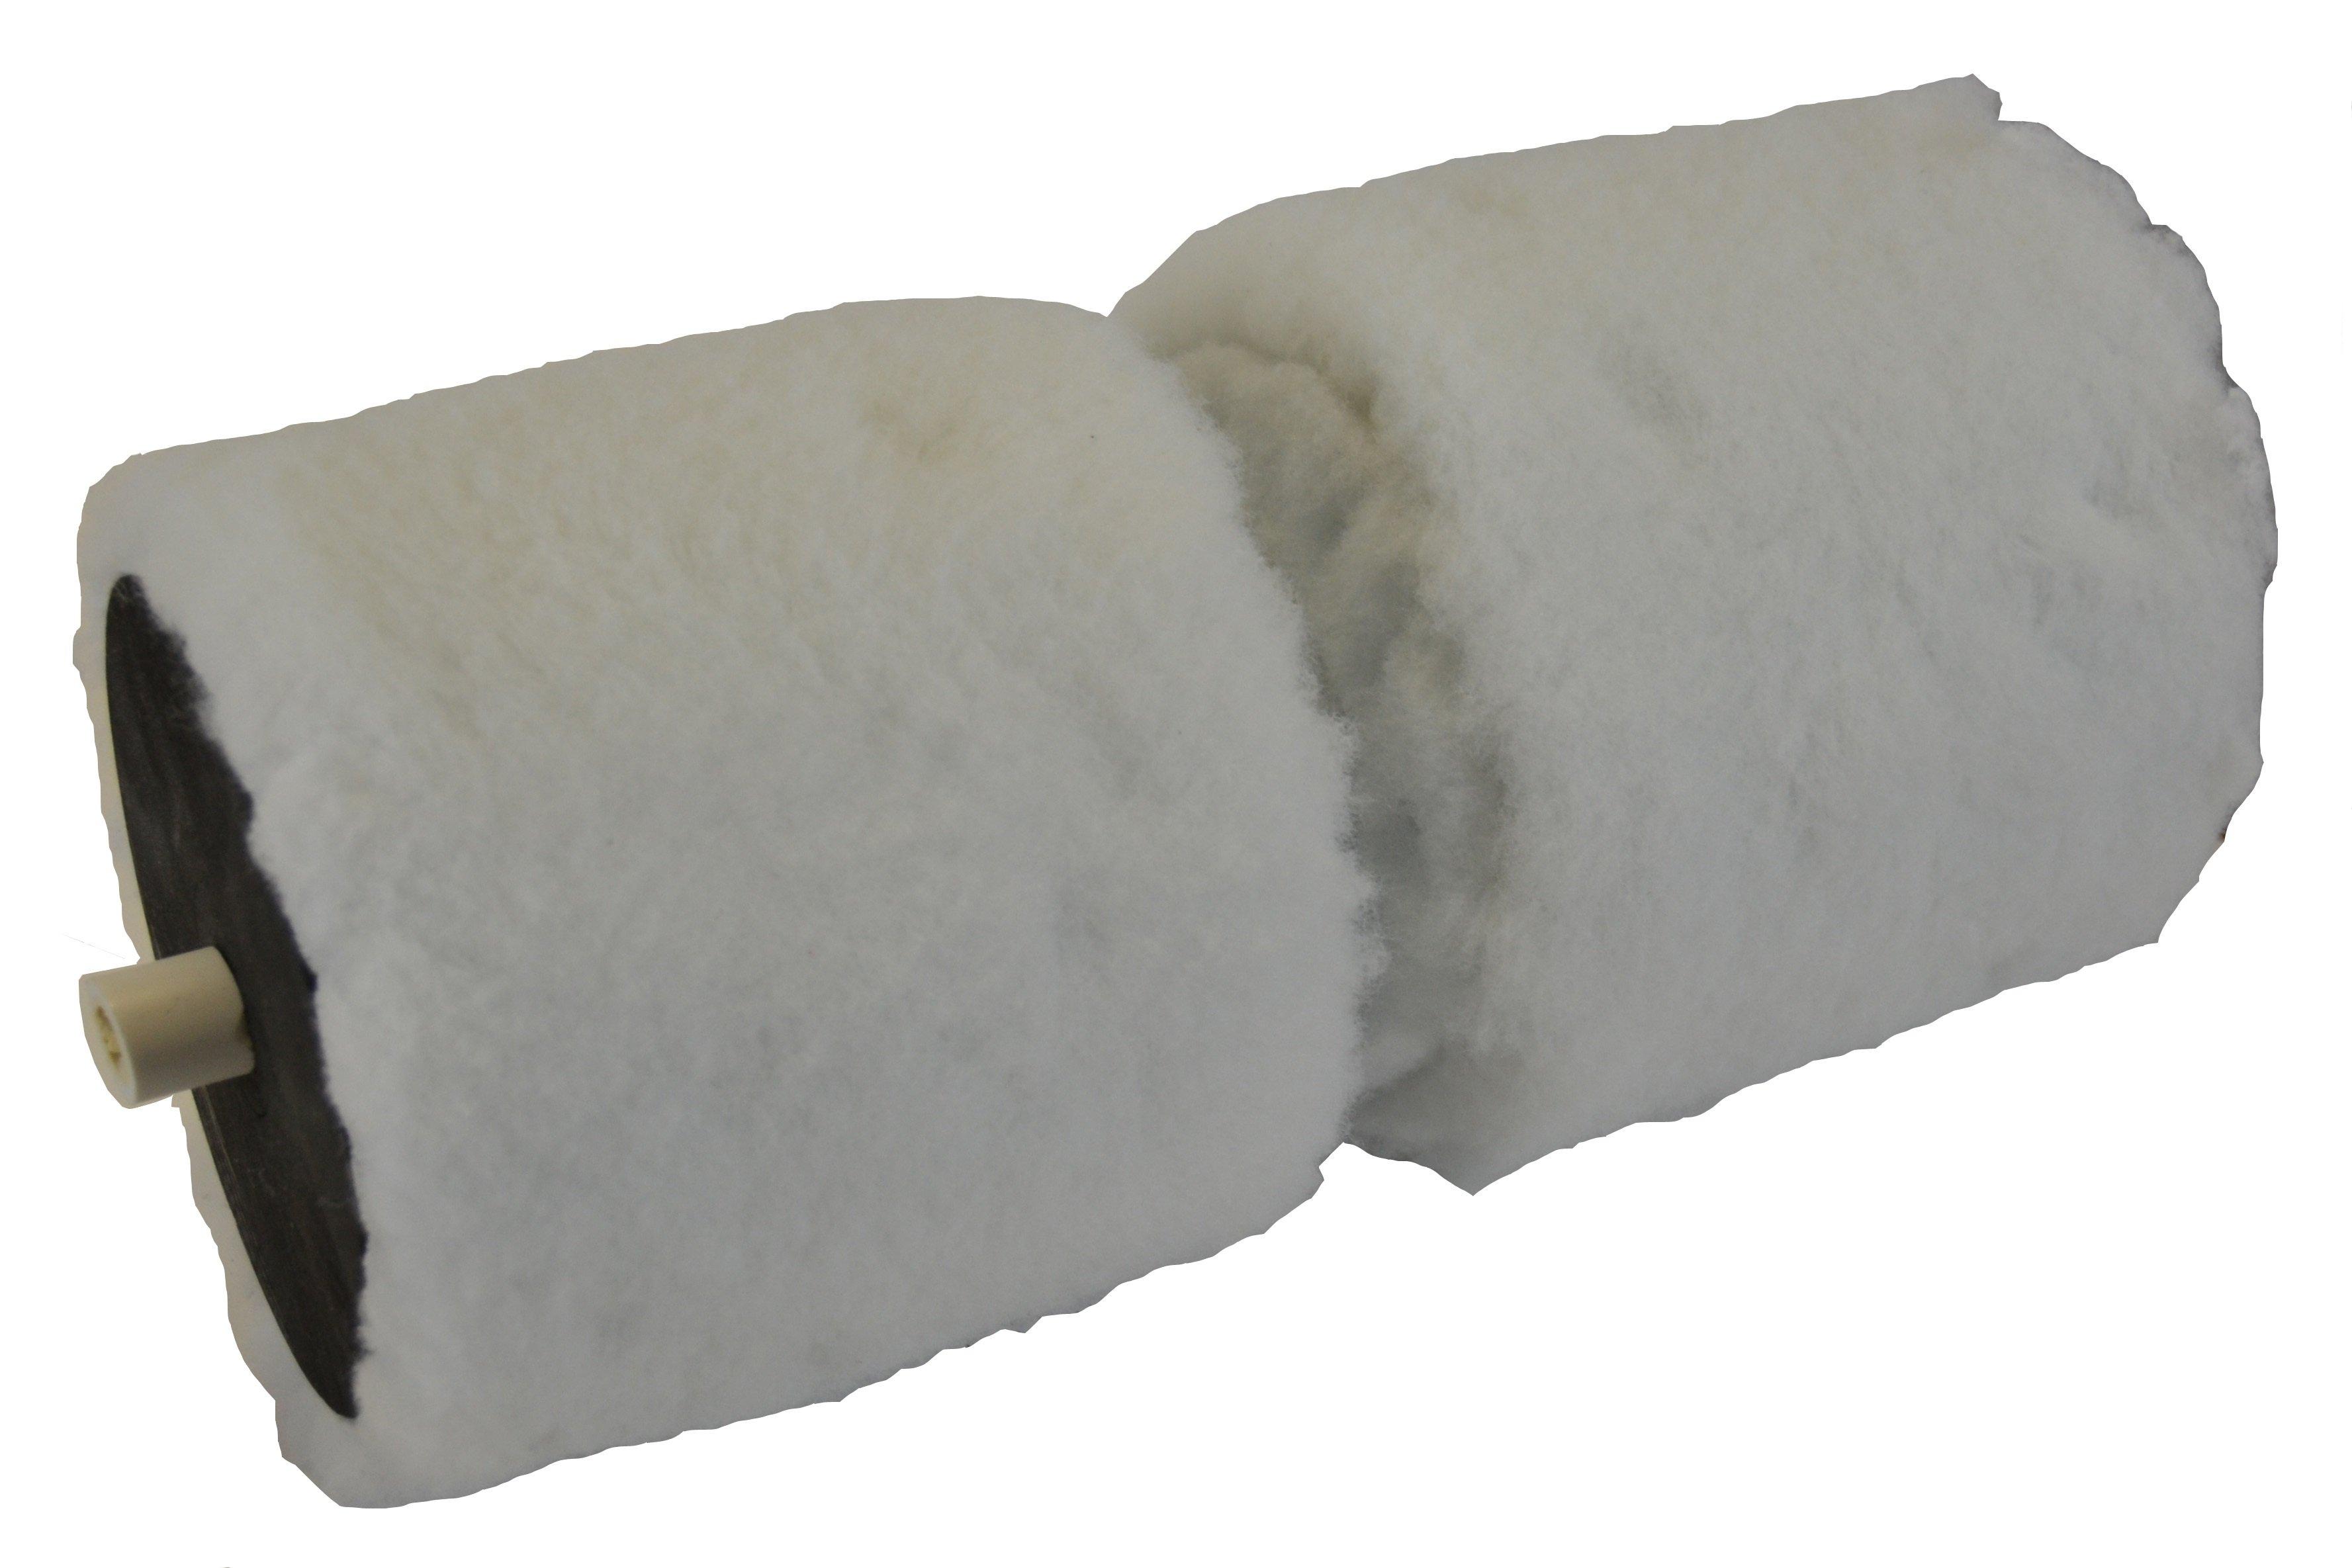 r profile roller